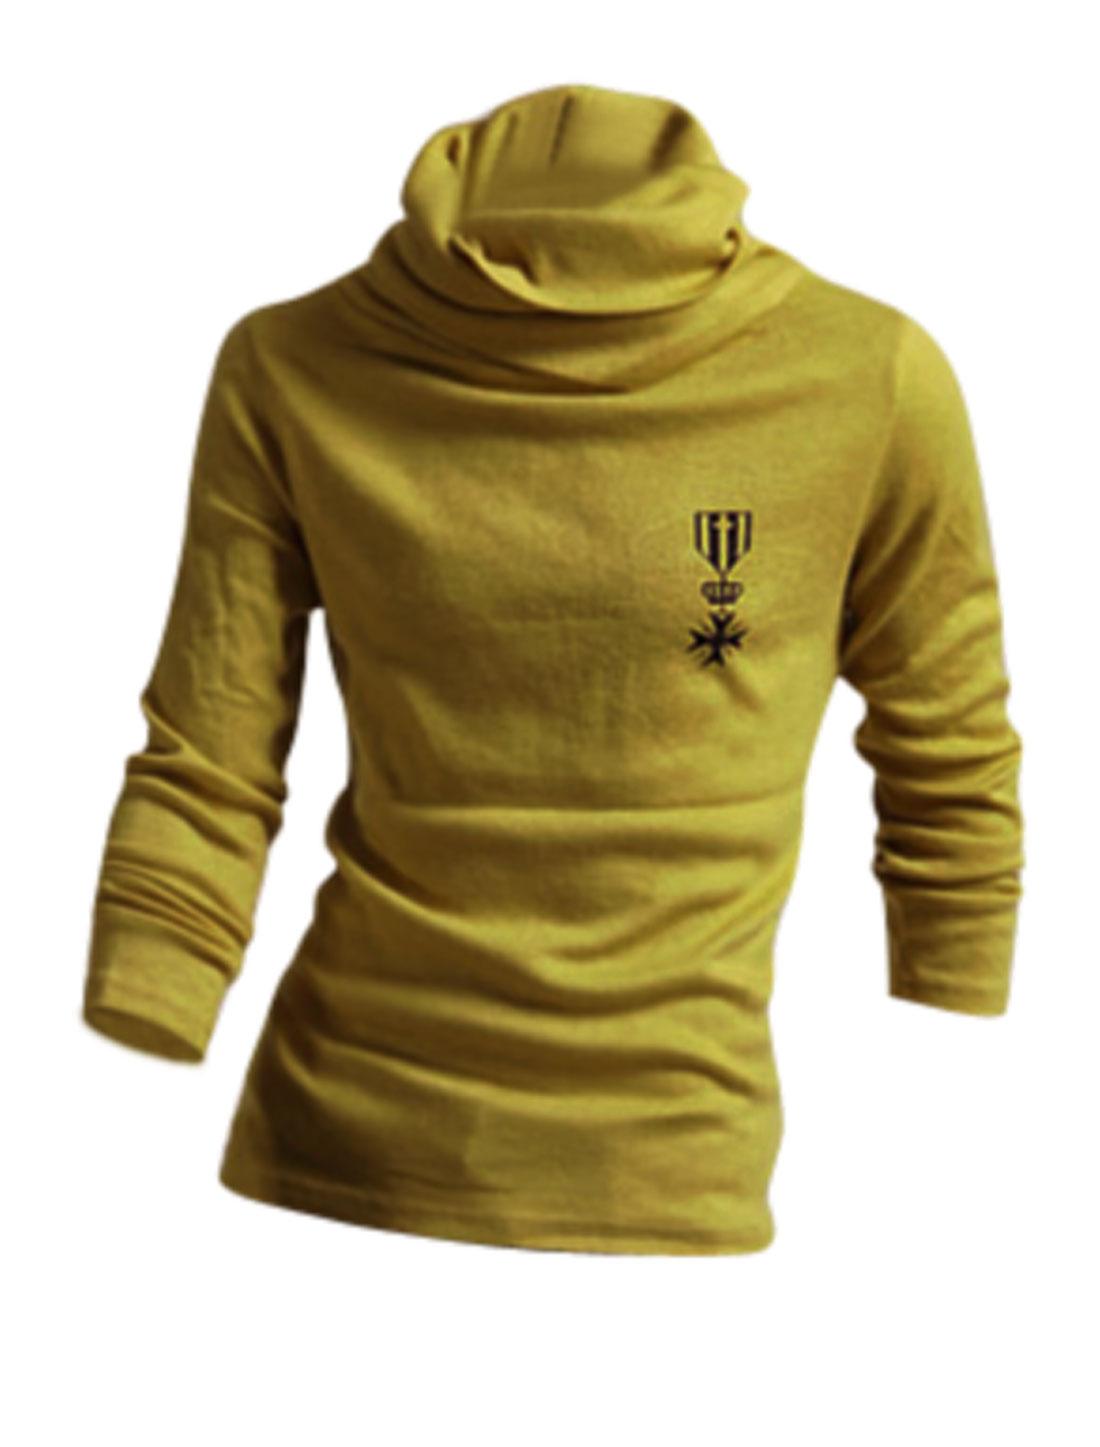 Men Cowl Neck Design Autumn Slim Top Shirt Olive Green M